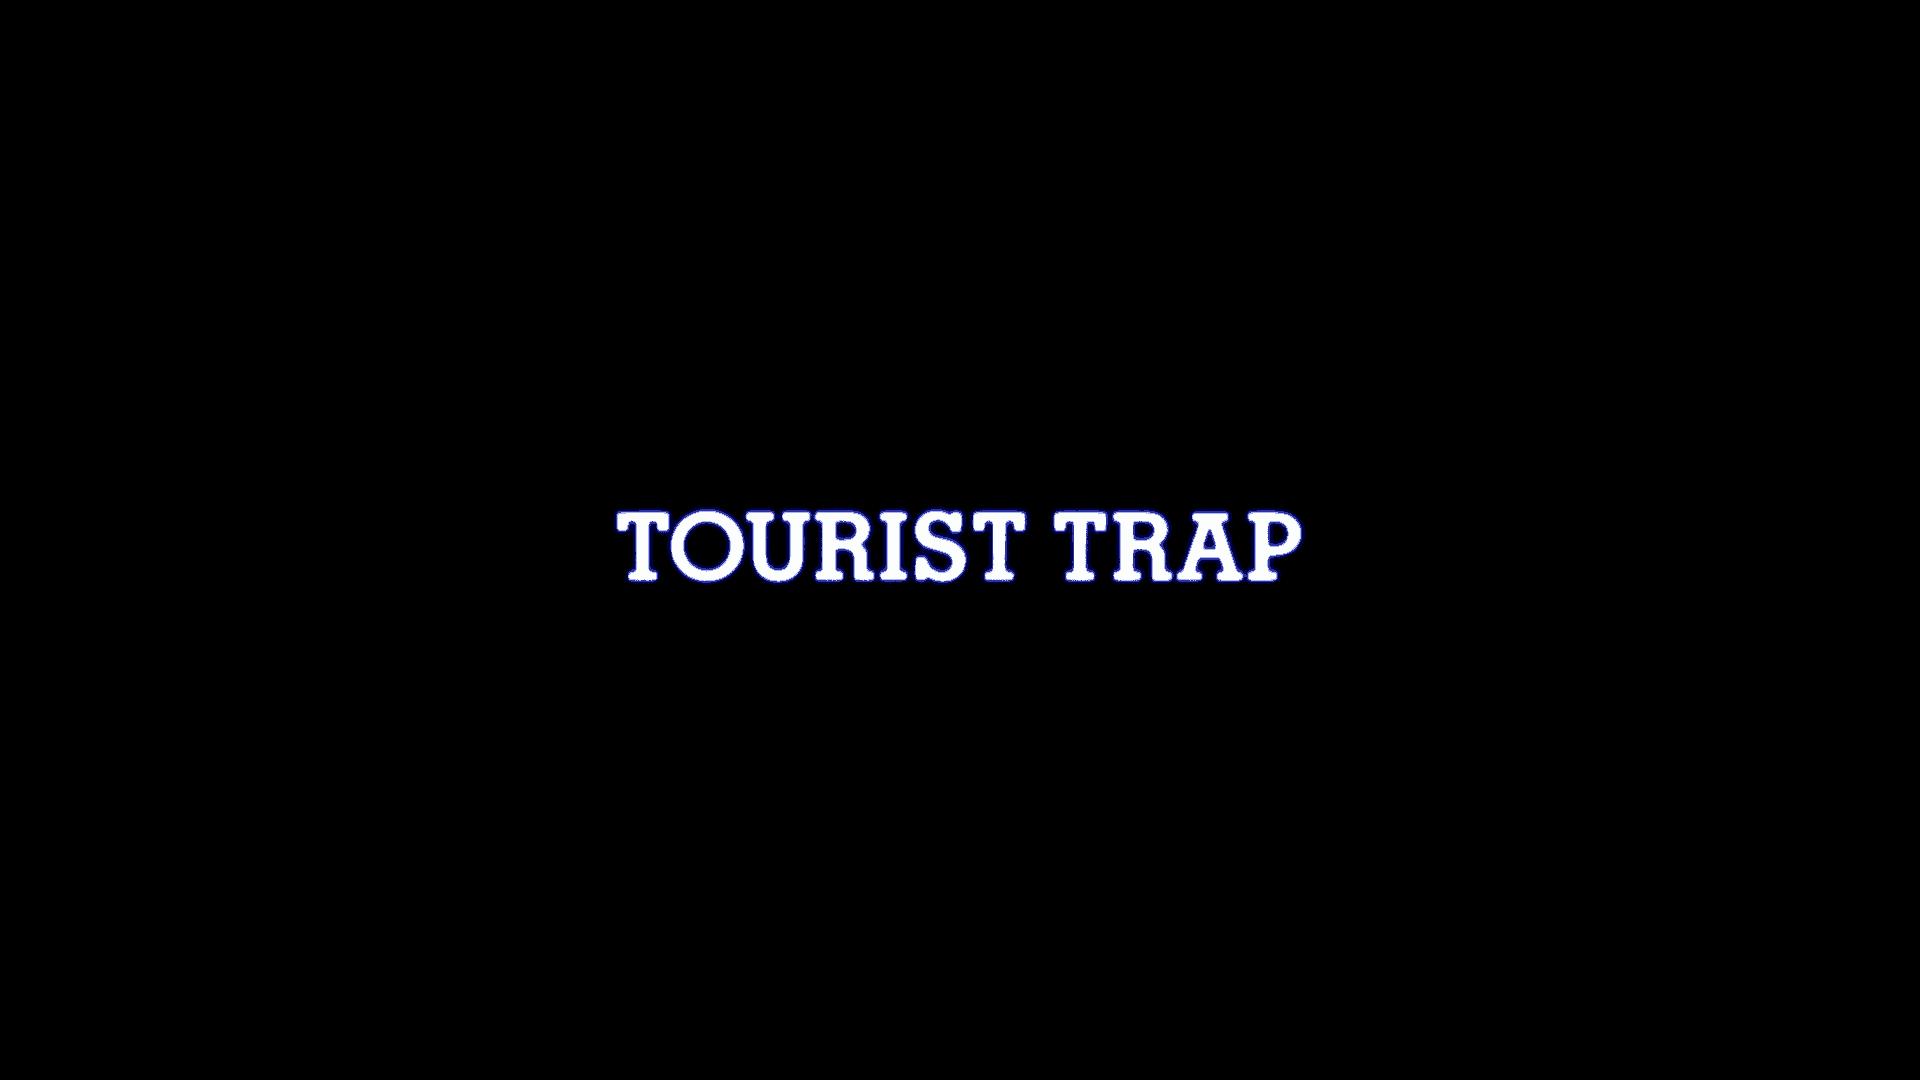 tourist trap title